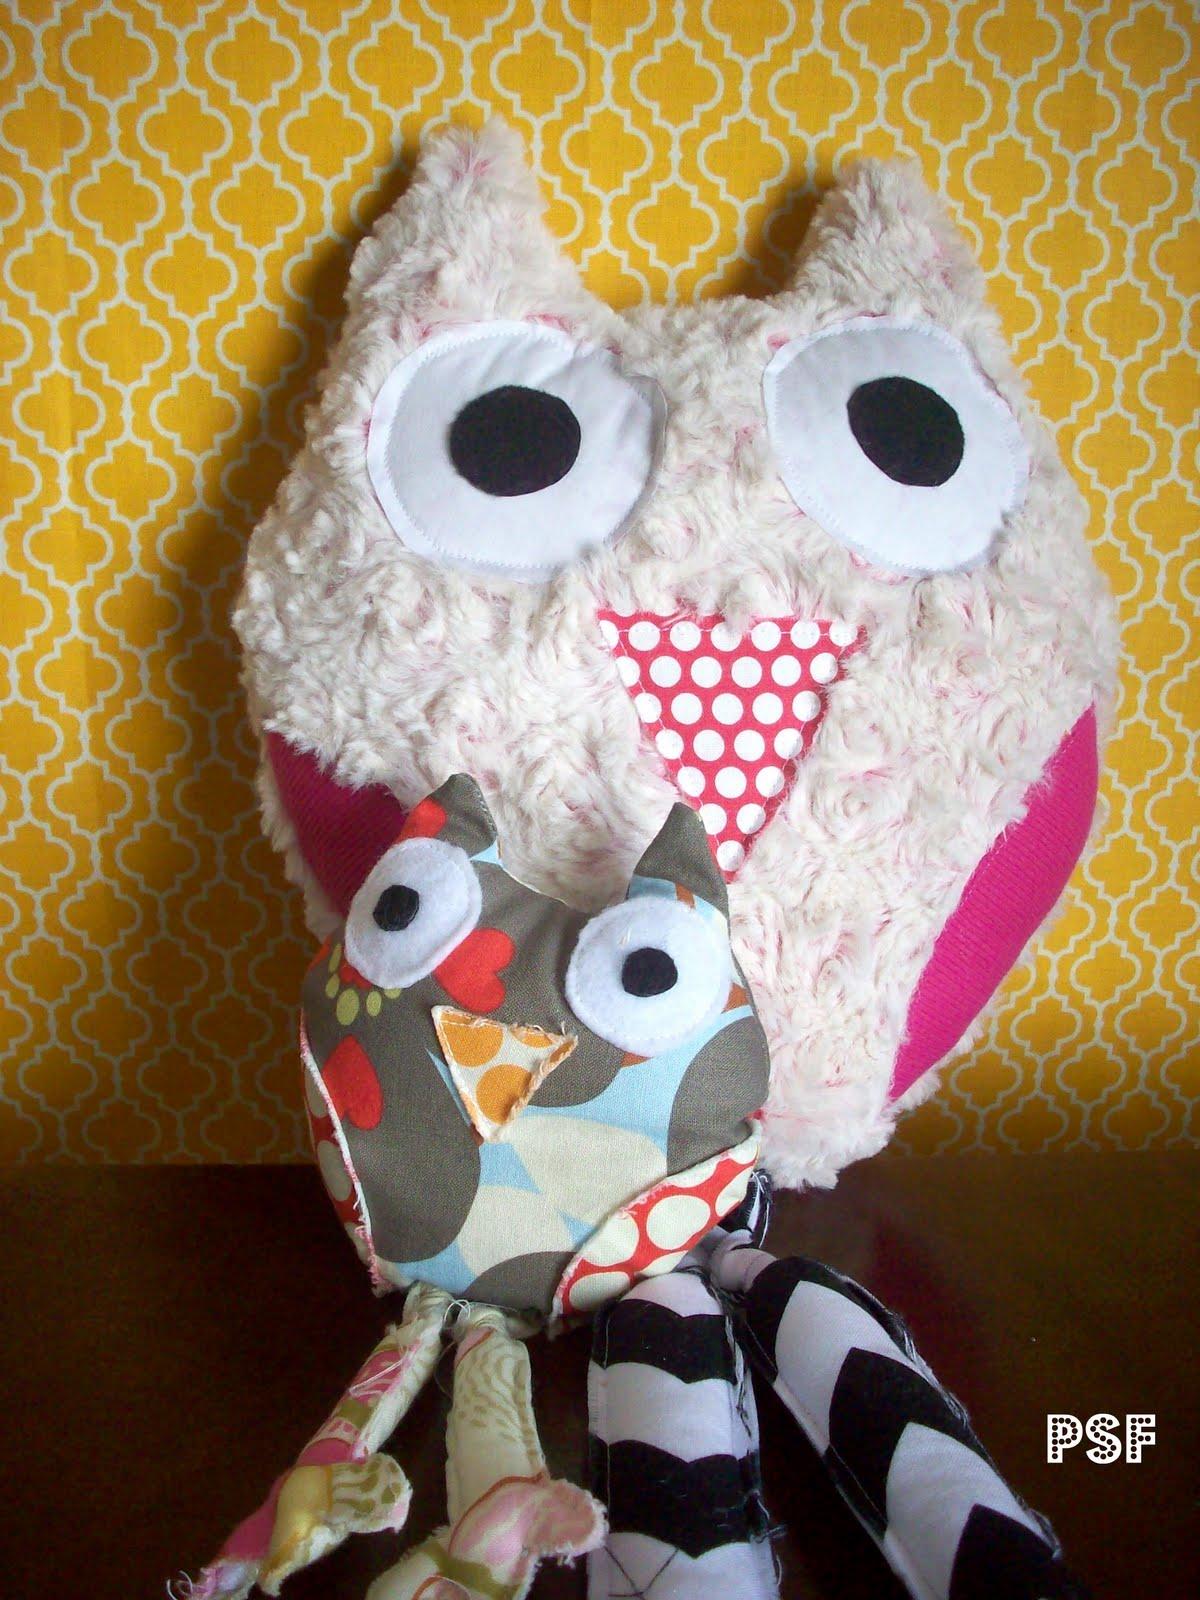 POPPYSEED FABRICS: Rose Cuddle Owl Pillow Tutorial